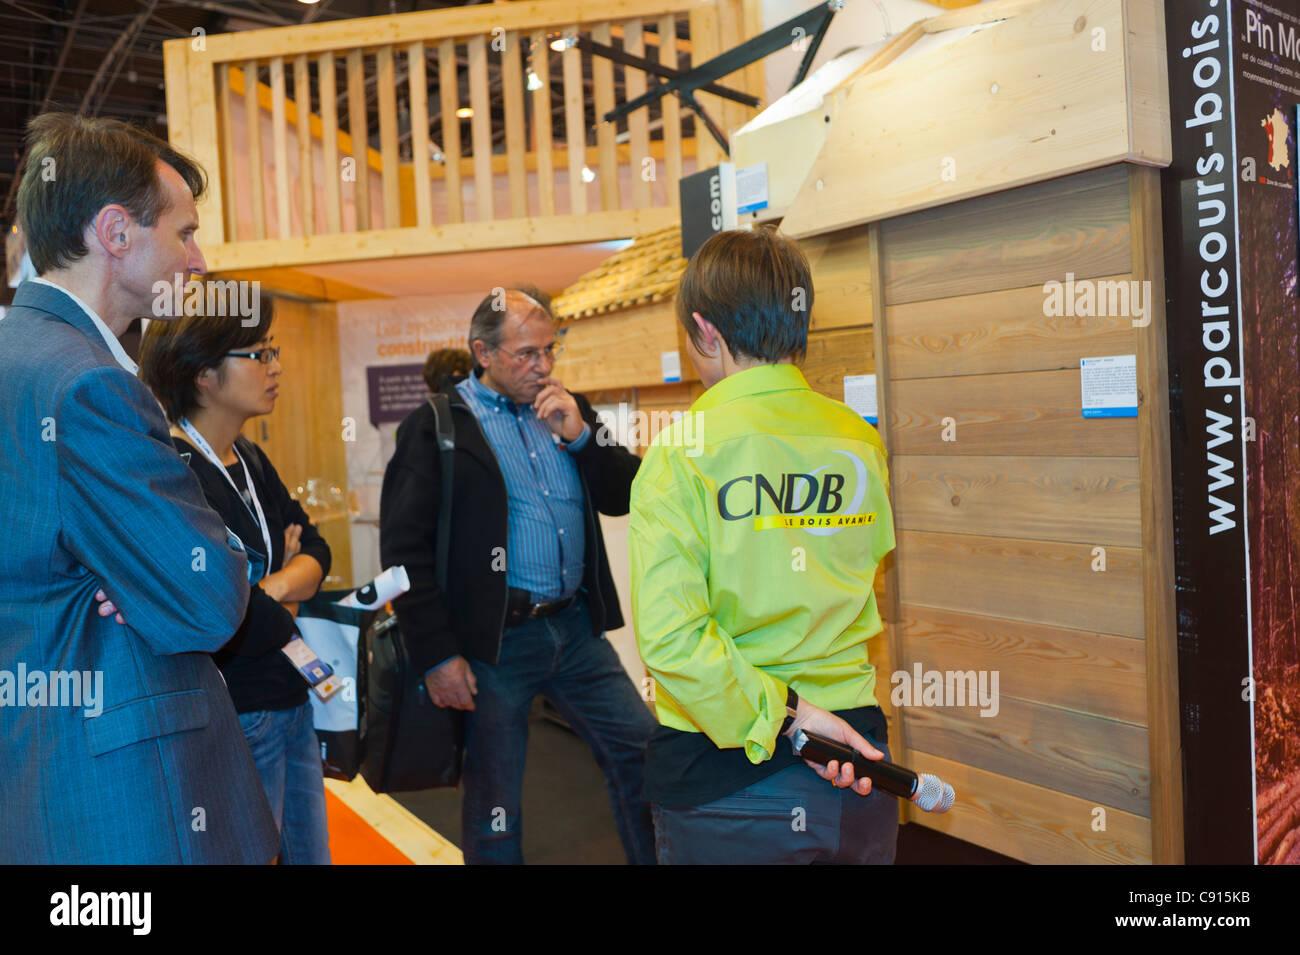 Lumber options trading